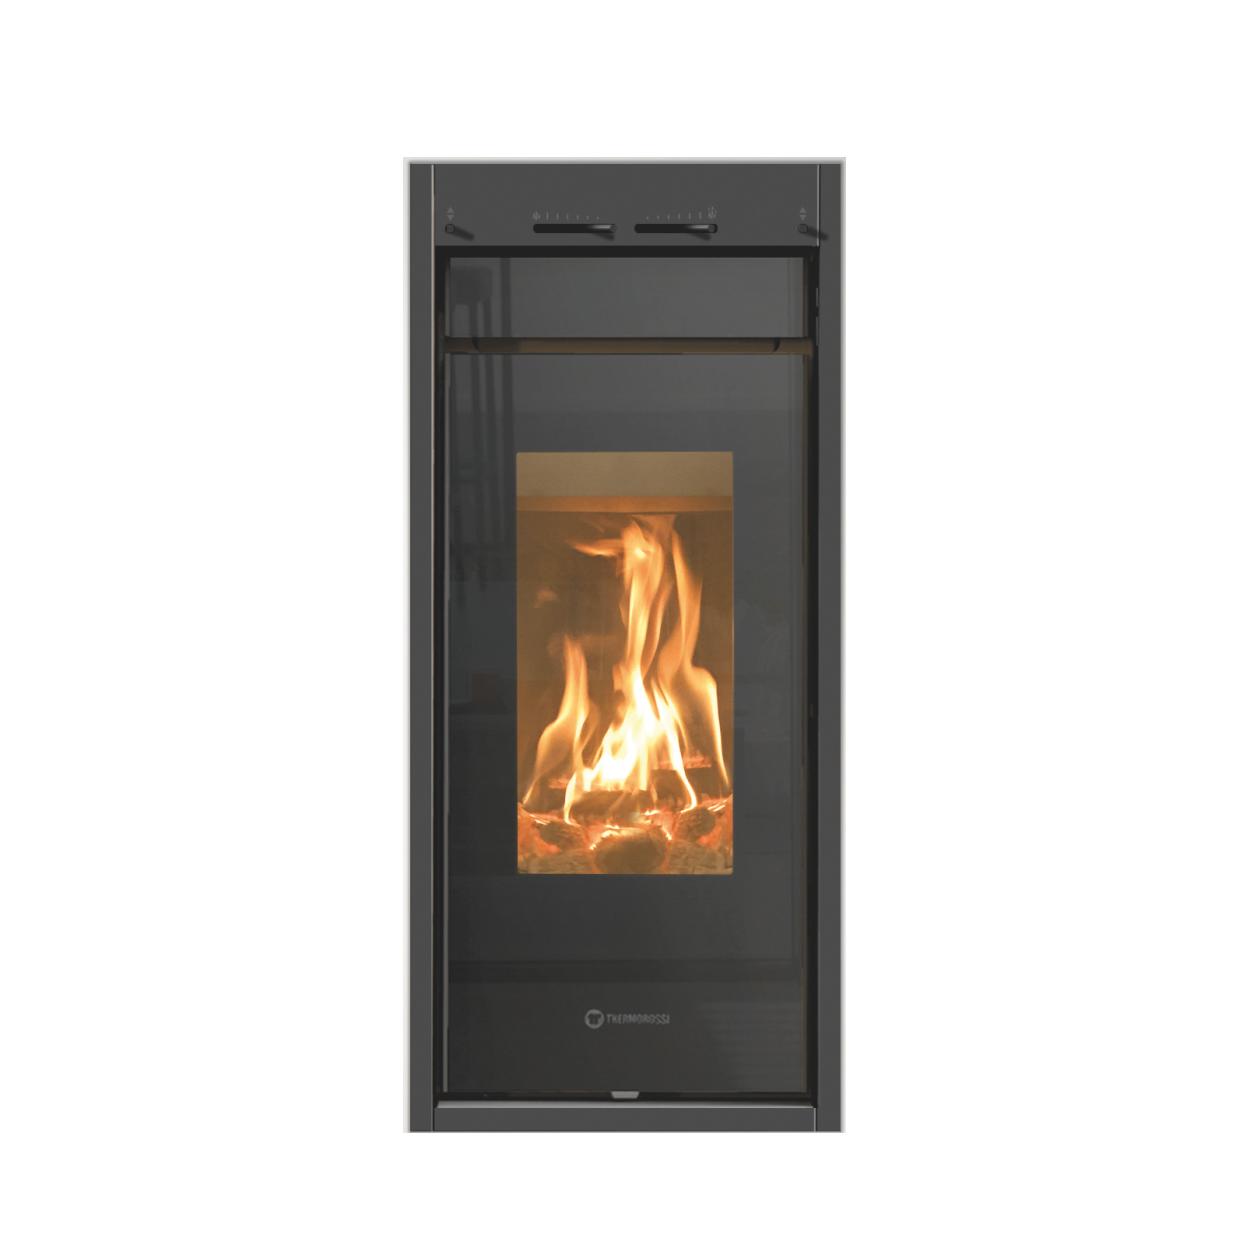 po le b ches vertical line wood thermorossi chauffage bois et granul s. Black Bedroom Furniture Sets. Home Design Ideas